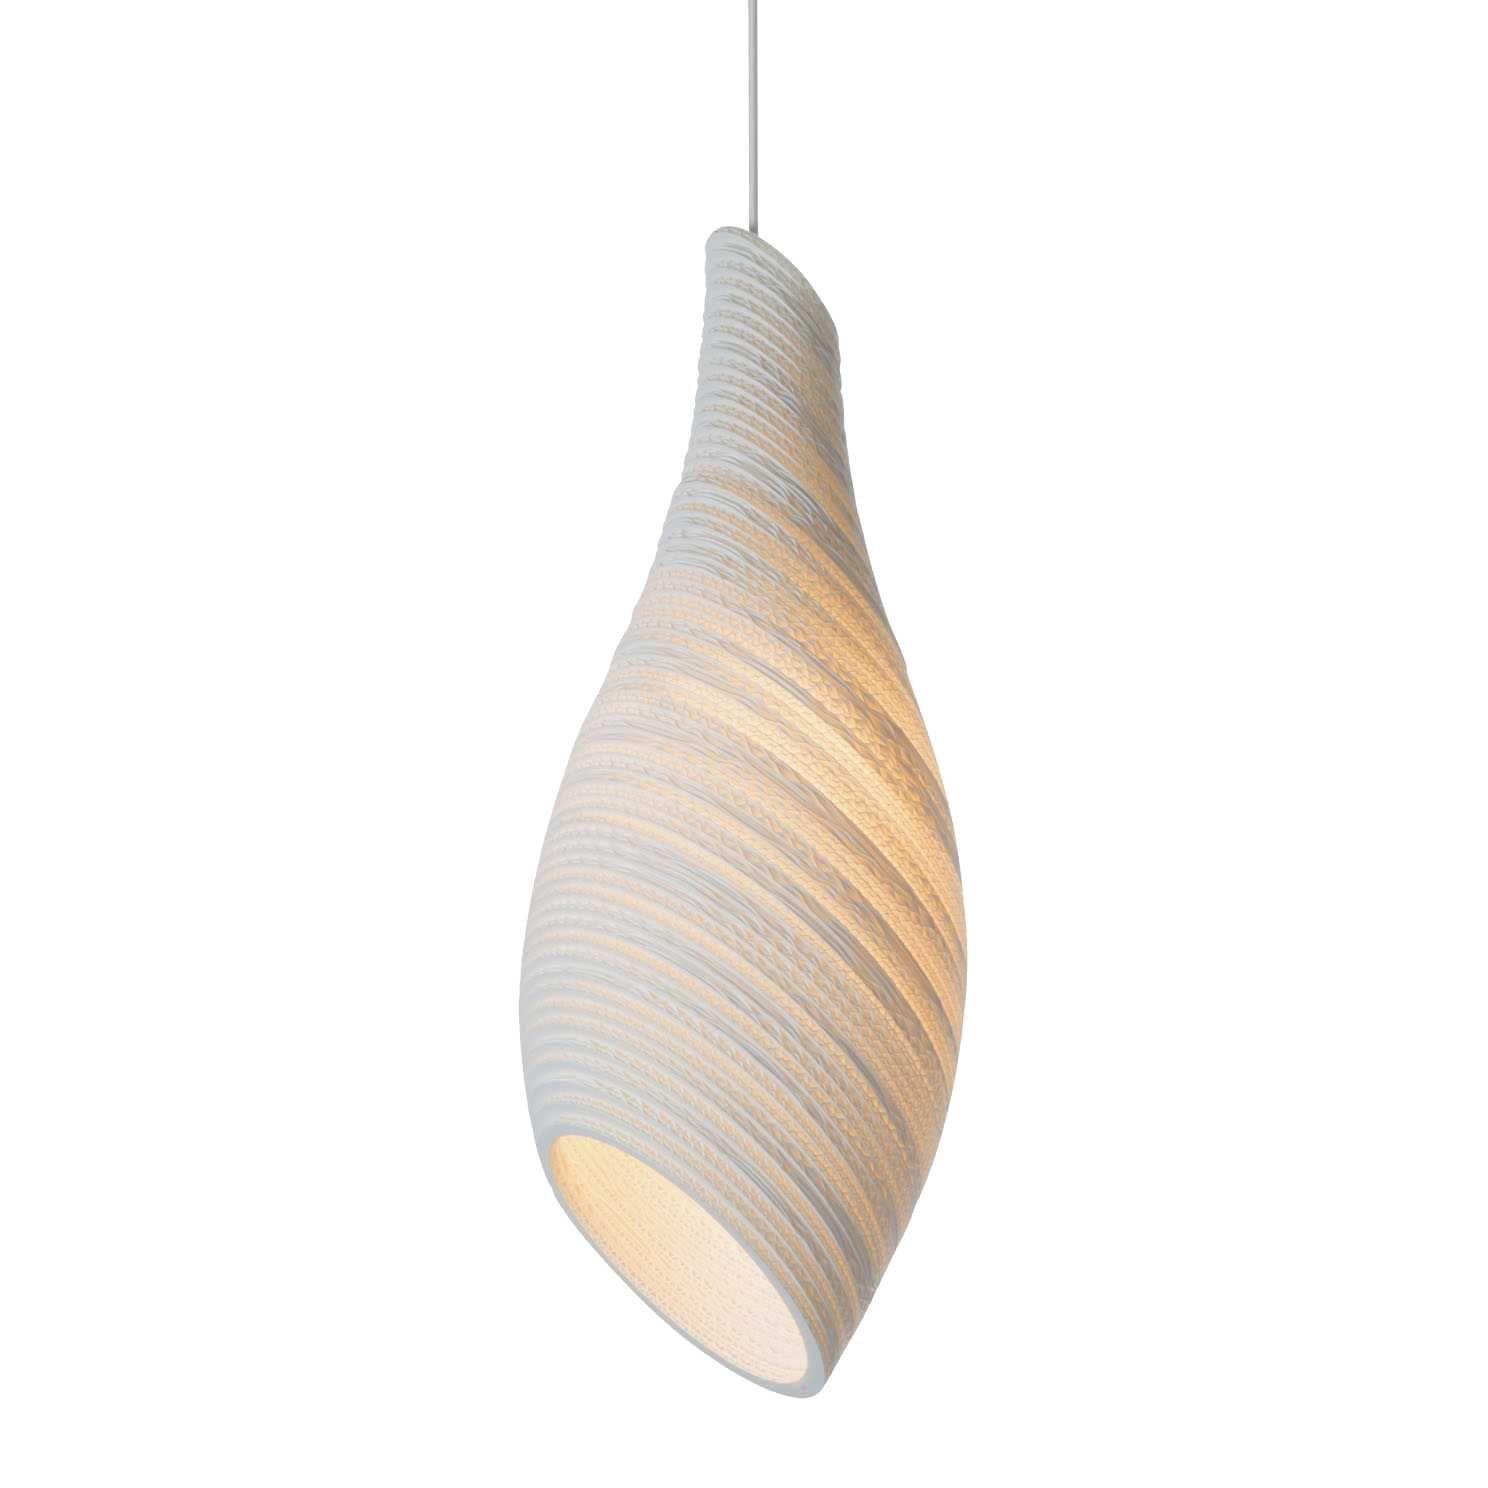 FonQ-Graypants Nest 24 hanglamp wit-aanbieding